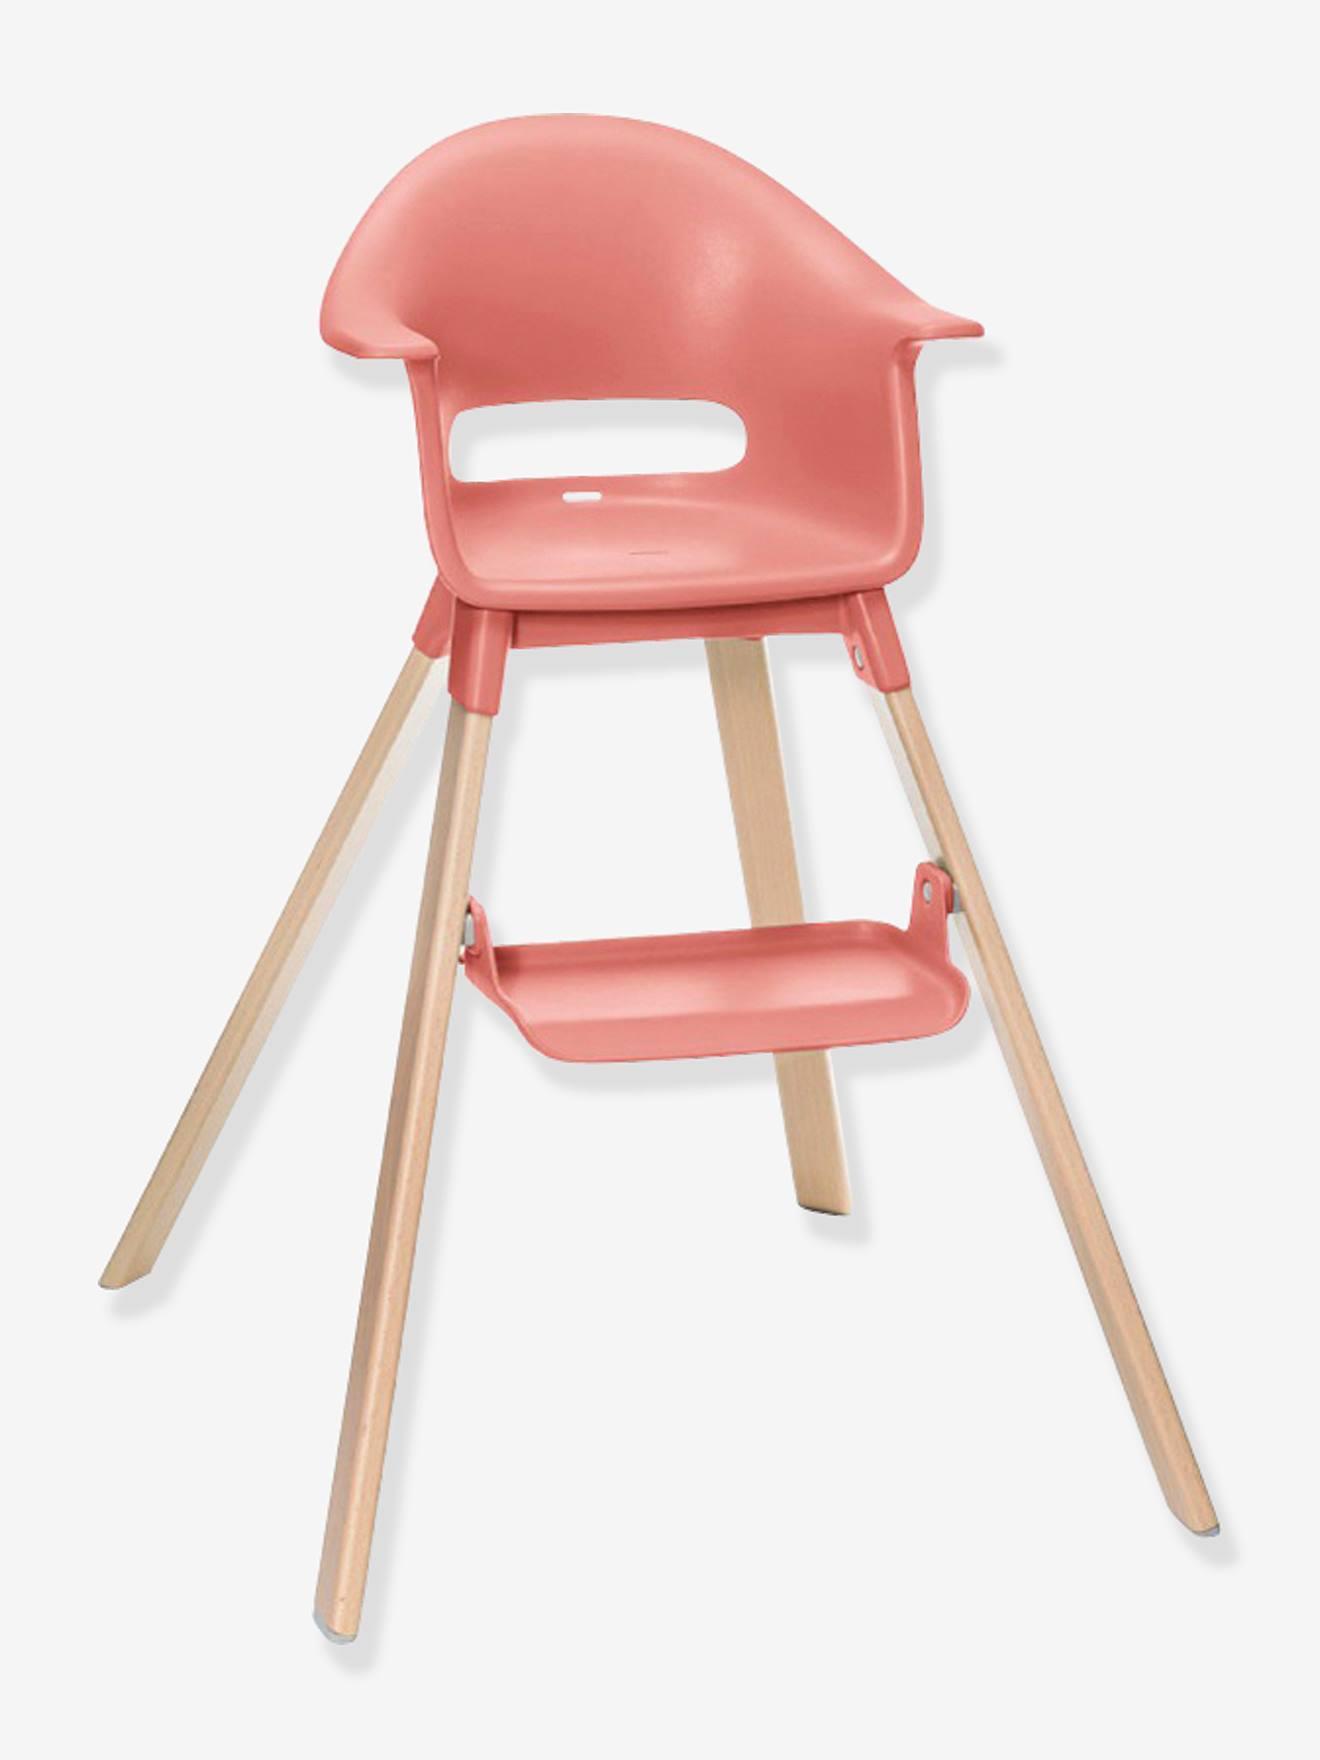 Chaise haute STOKKE Clikk corail